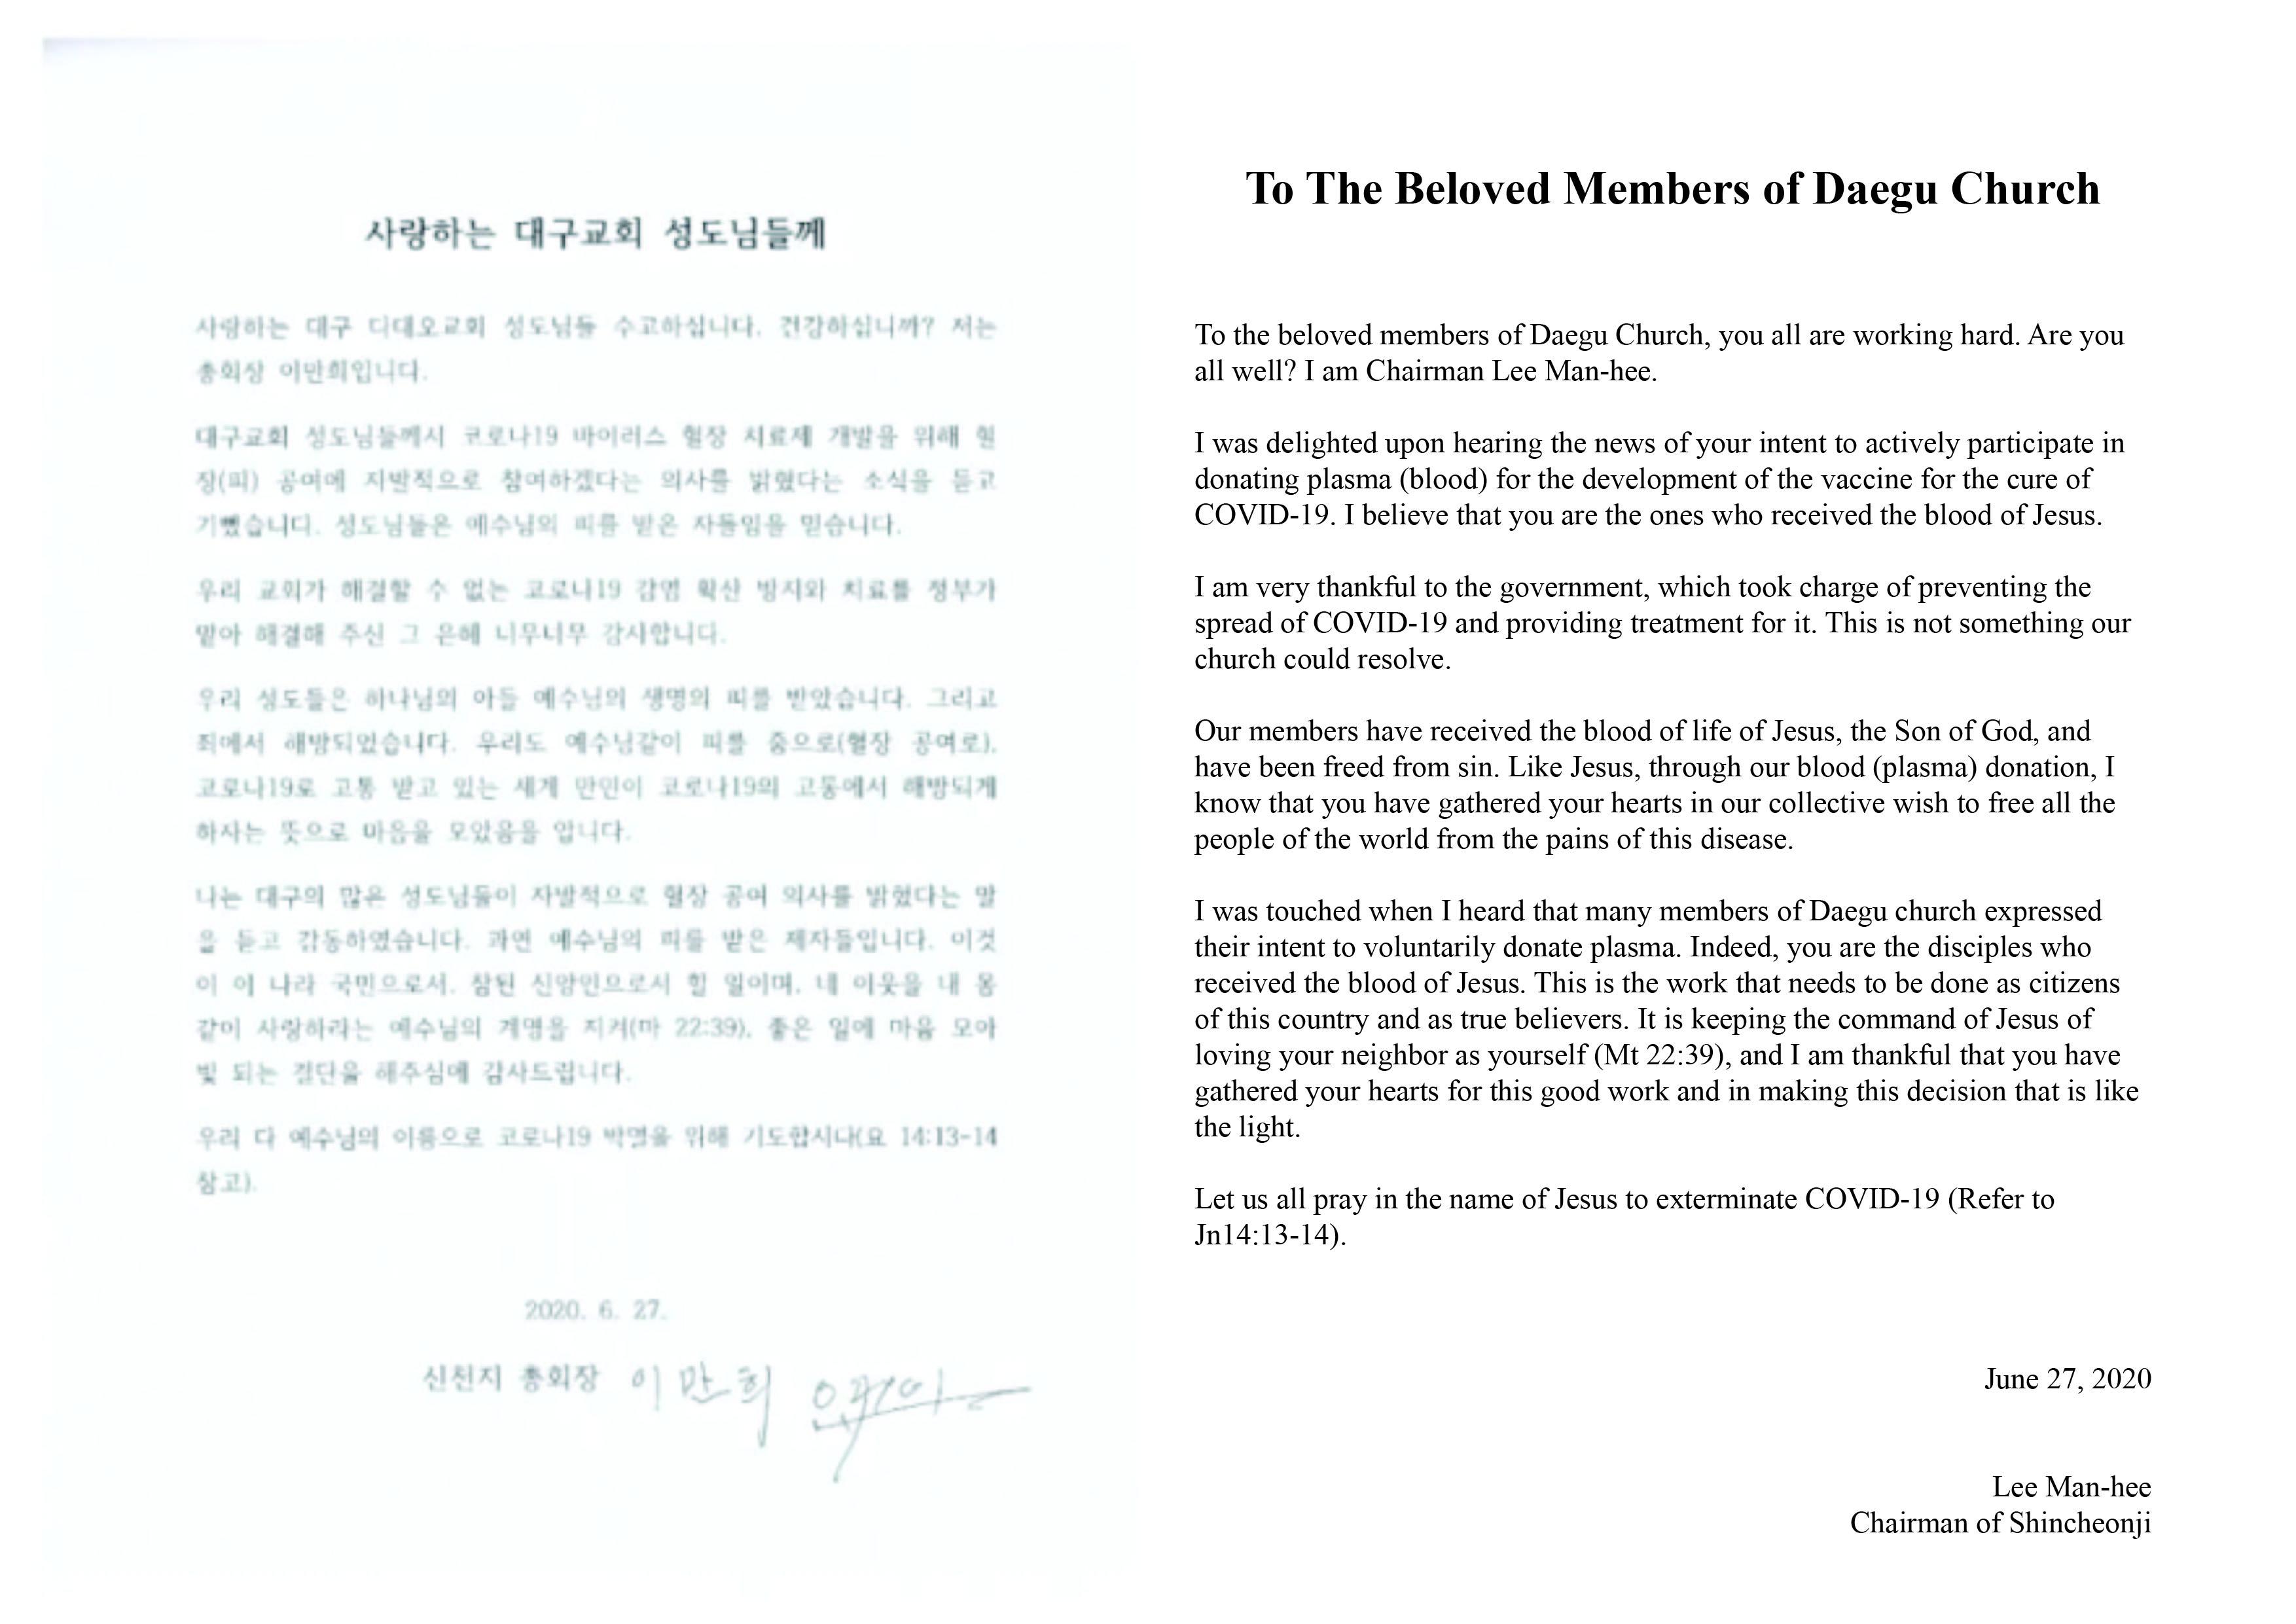 Shincheonji Chairman Lee Manhees Letter Provided by Shincheonji Church in Daegu